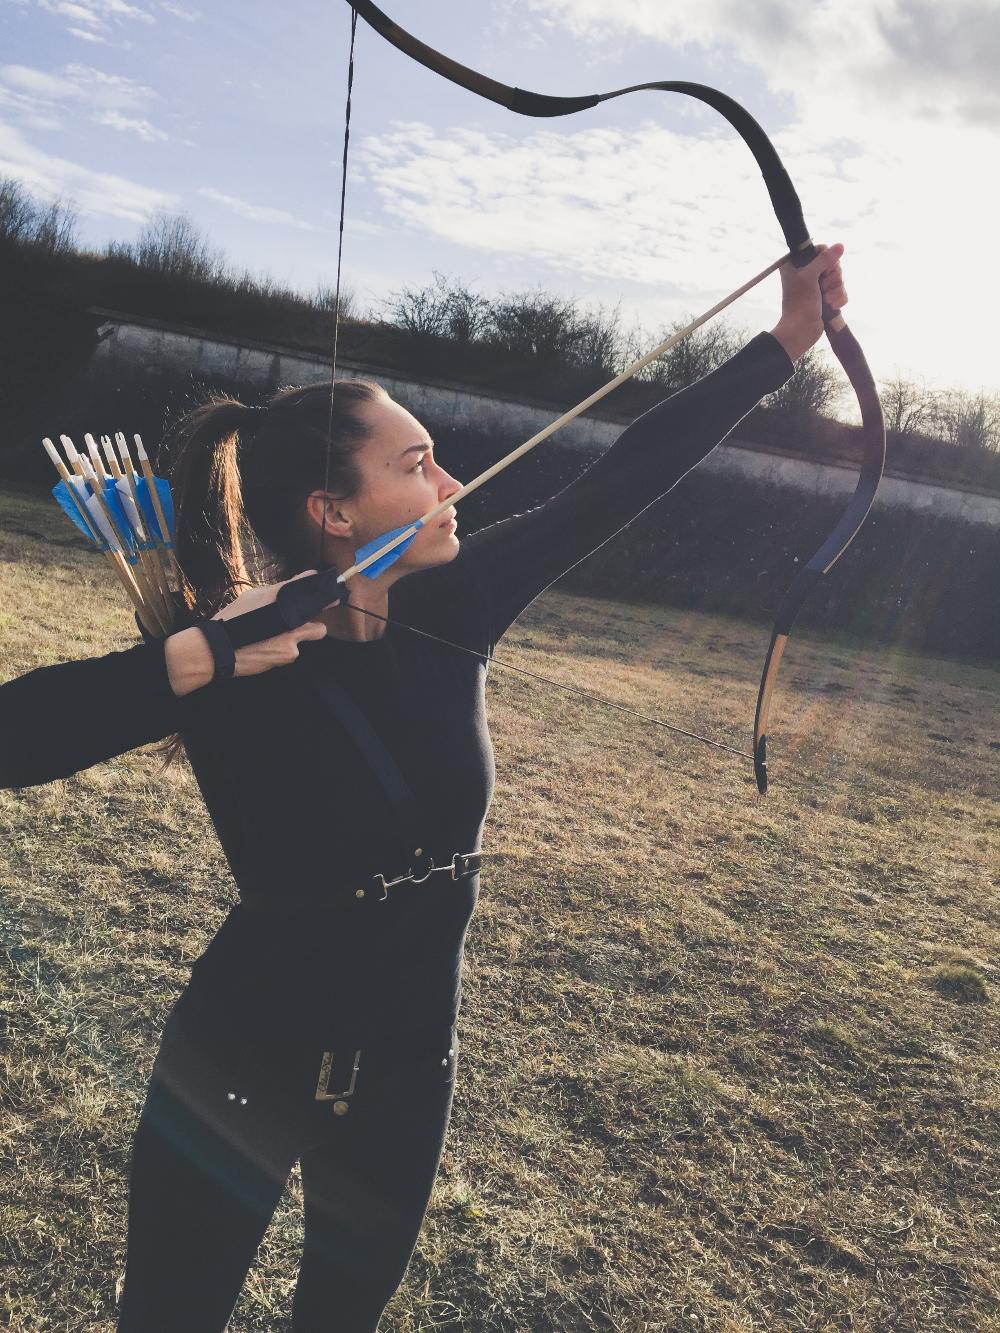 Pin On Archery